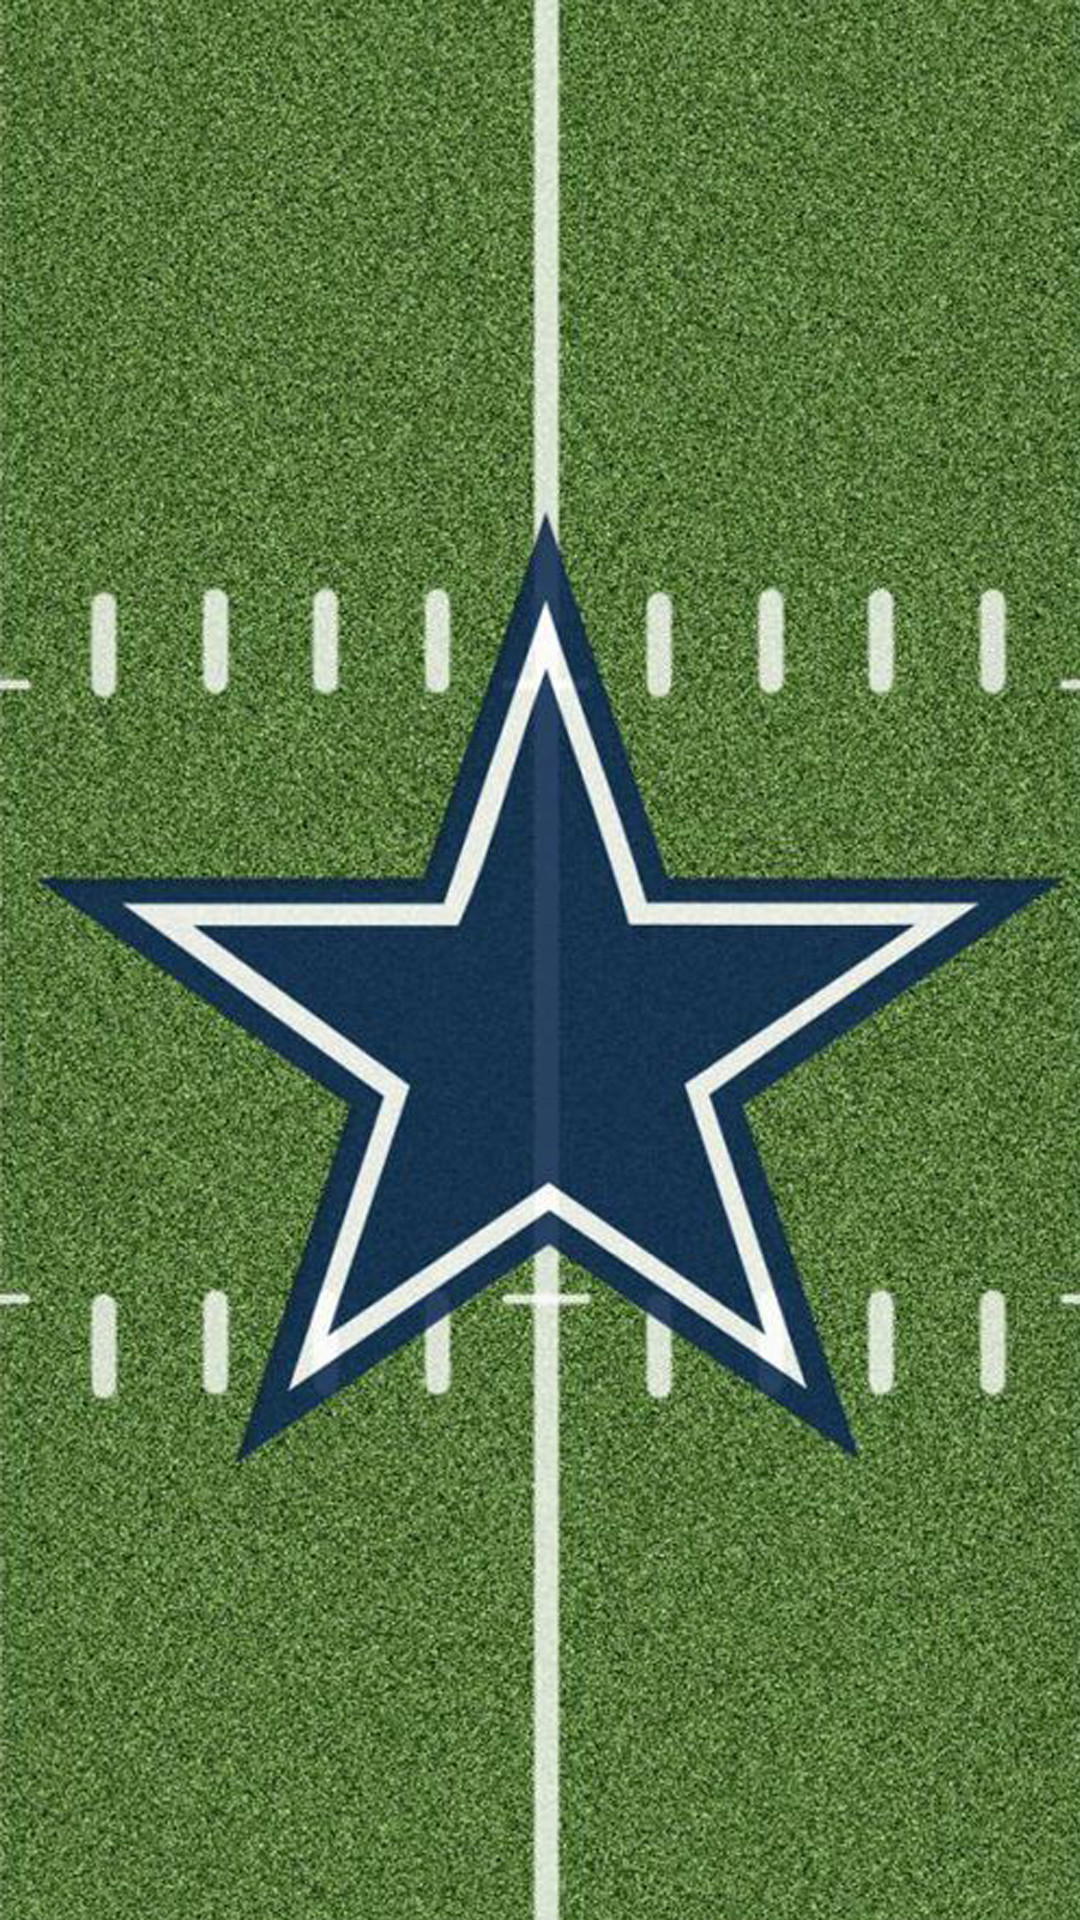 Raiders Logo Wallpaper Iphone Dallas Cowboys 2018 Wallpapers 55 Images